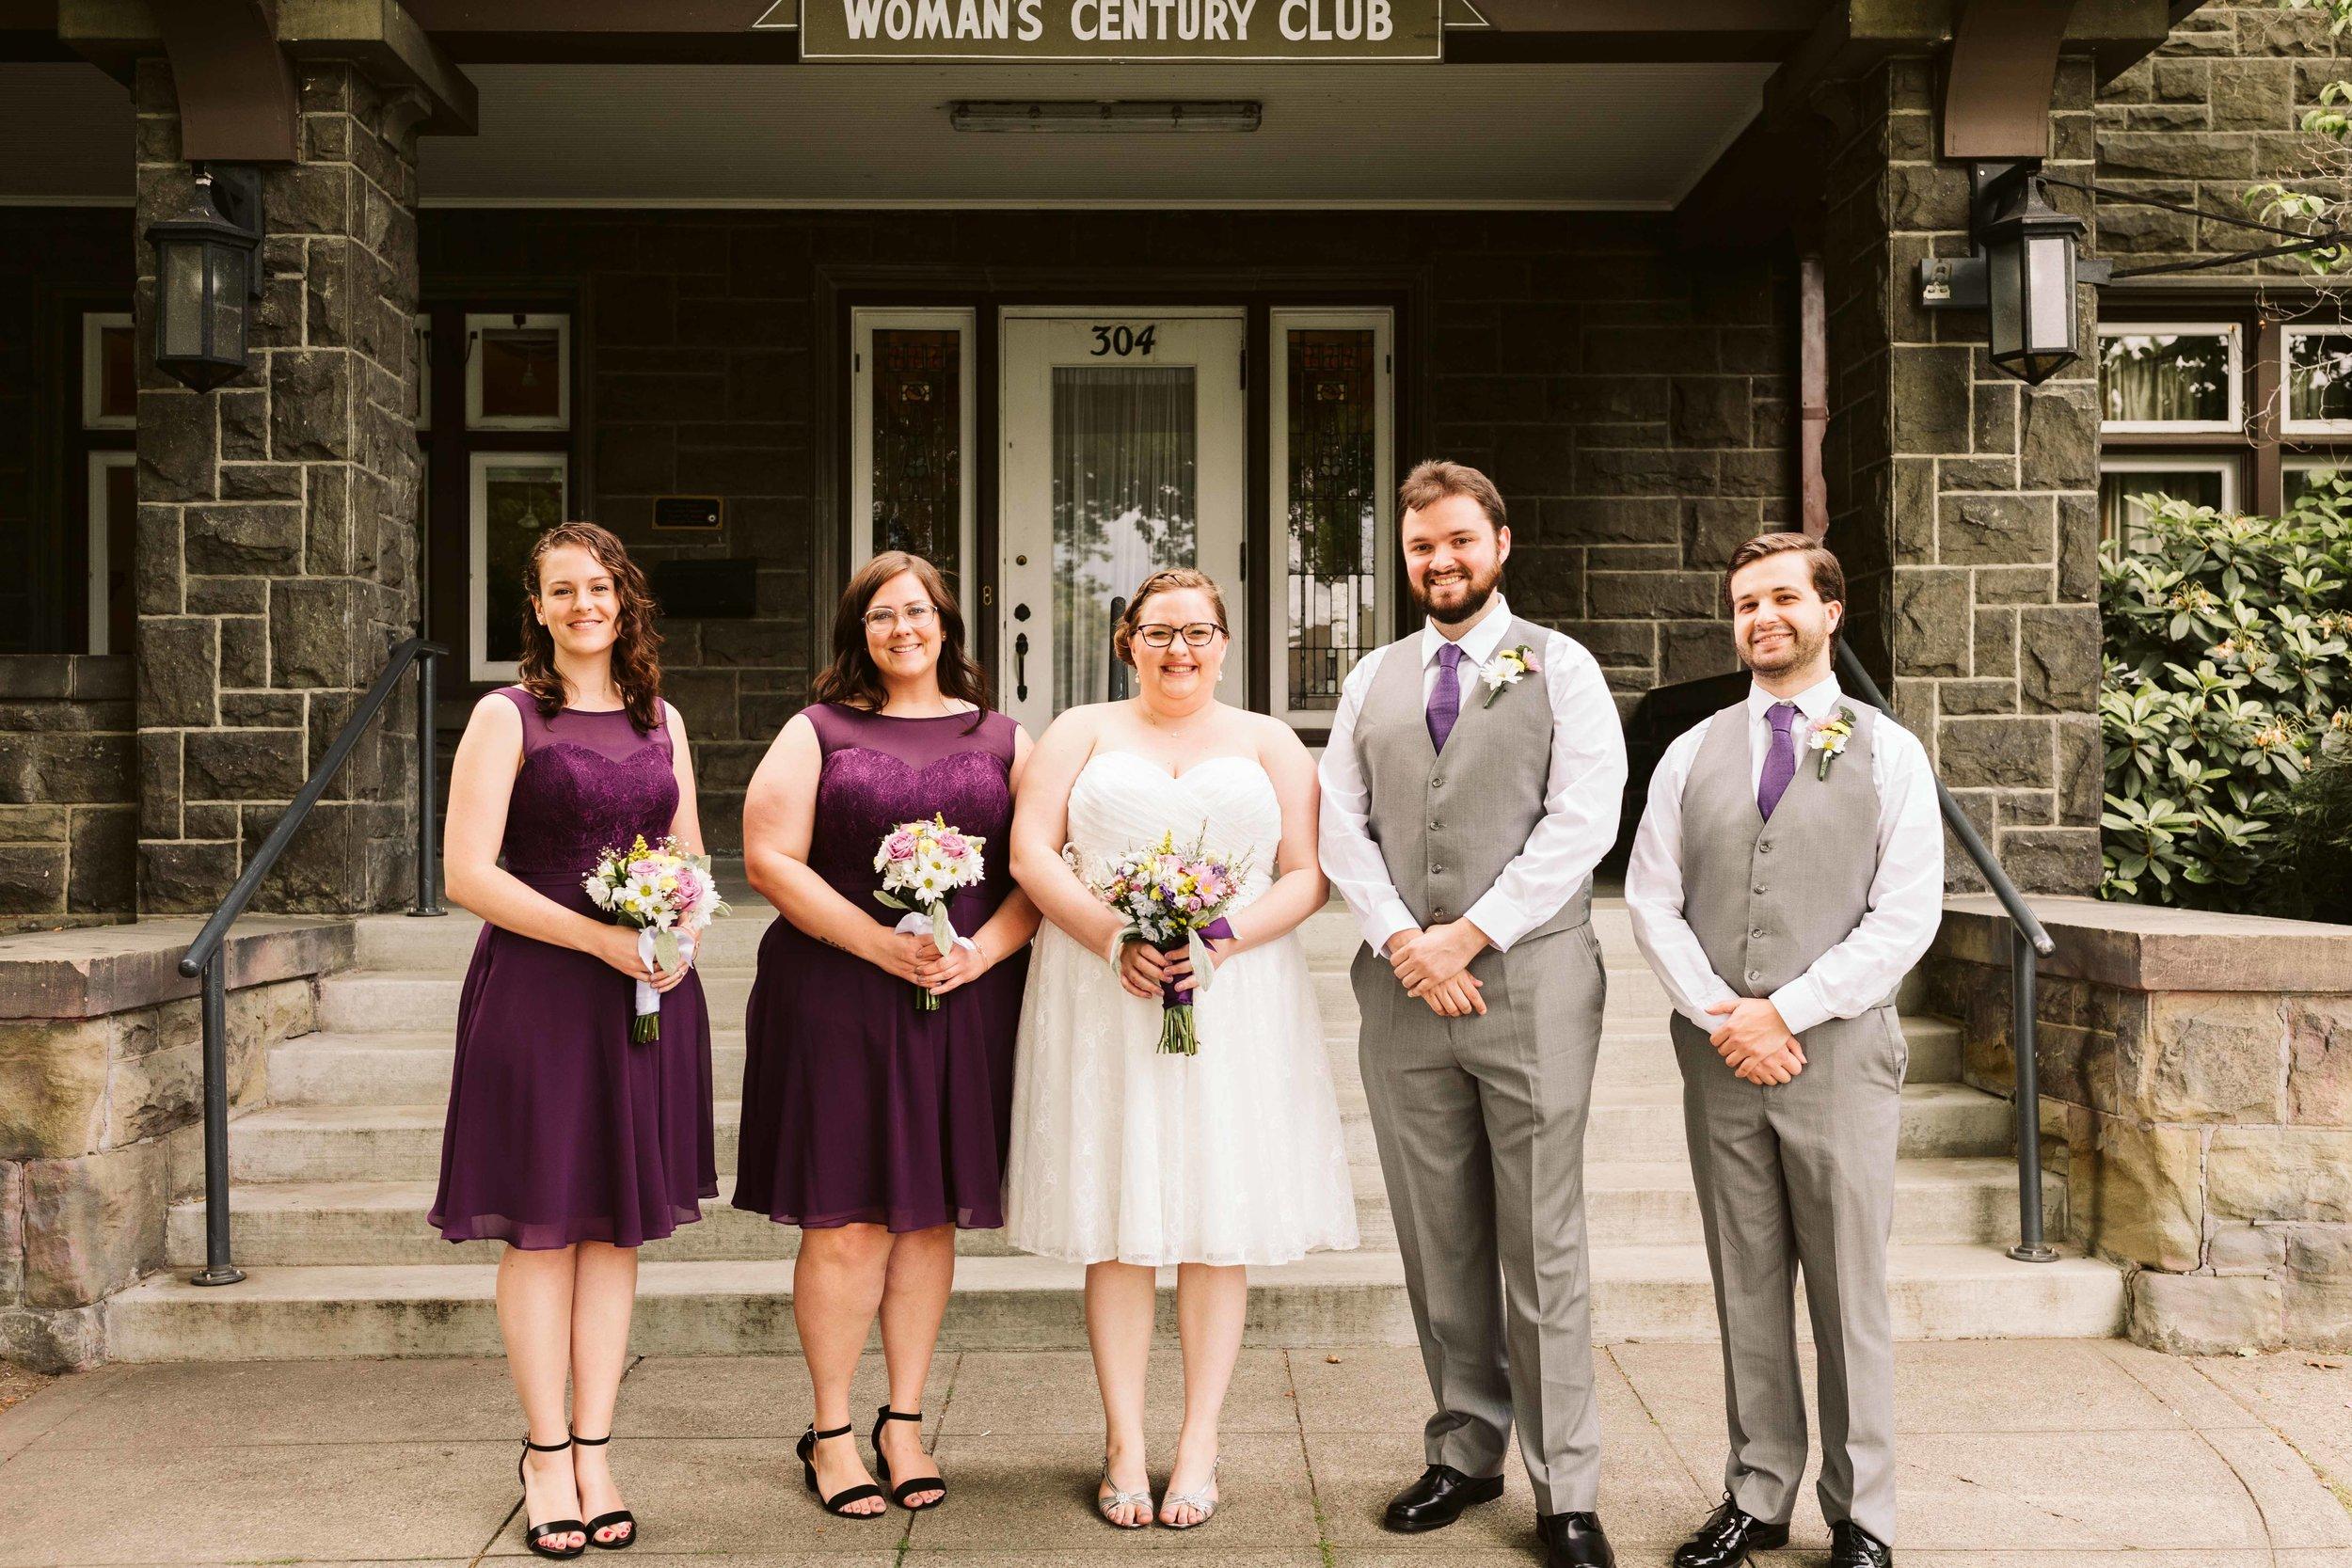 womens-century-club-wedding-35.jpg